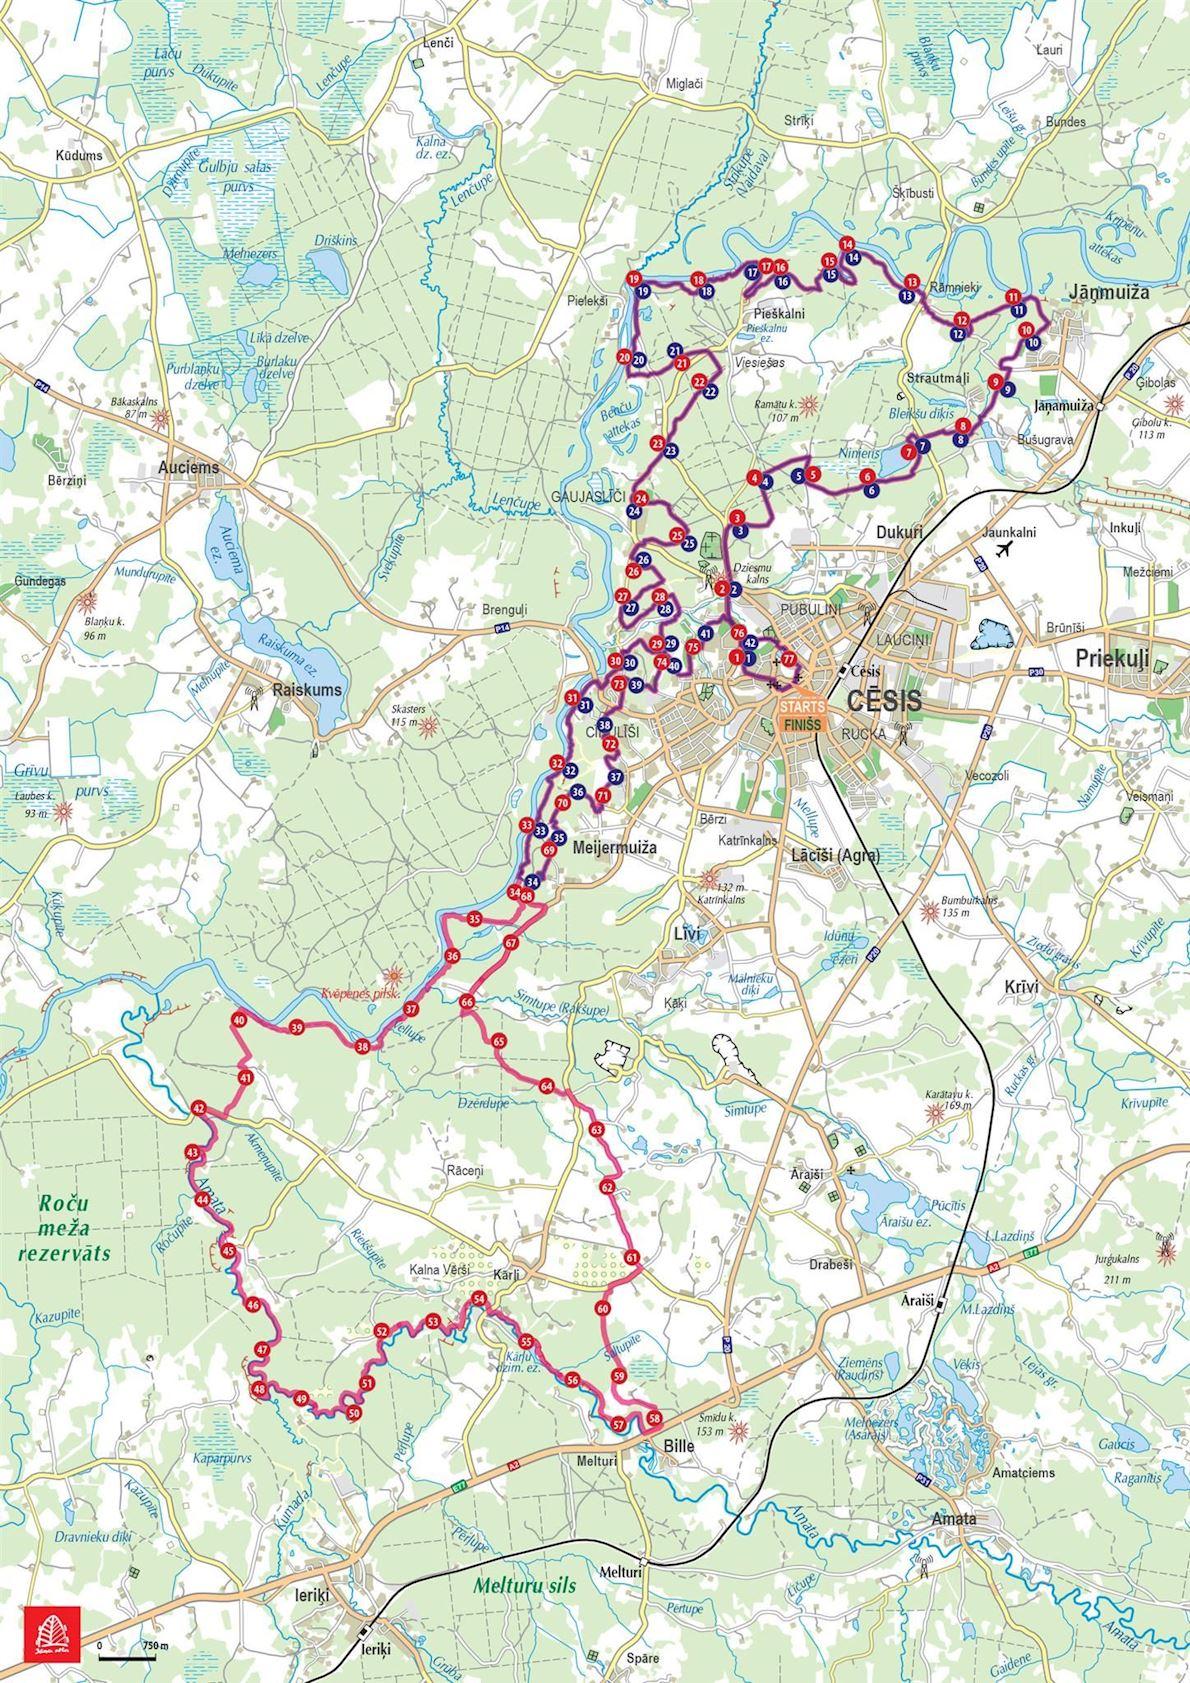 Cēsis ECO Trail 路线图